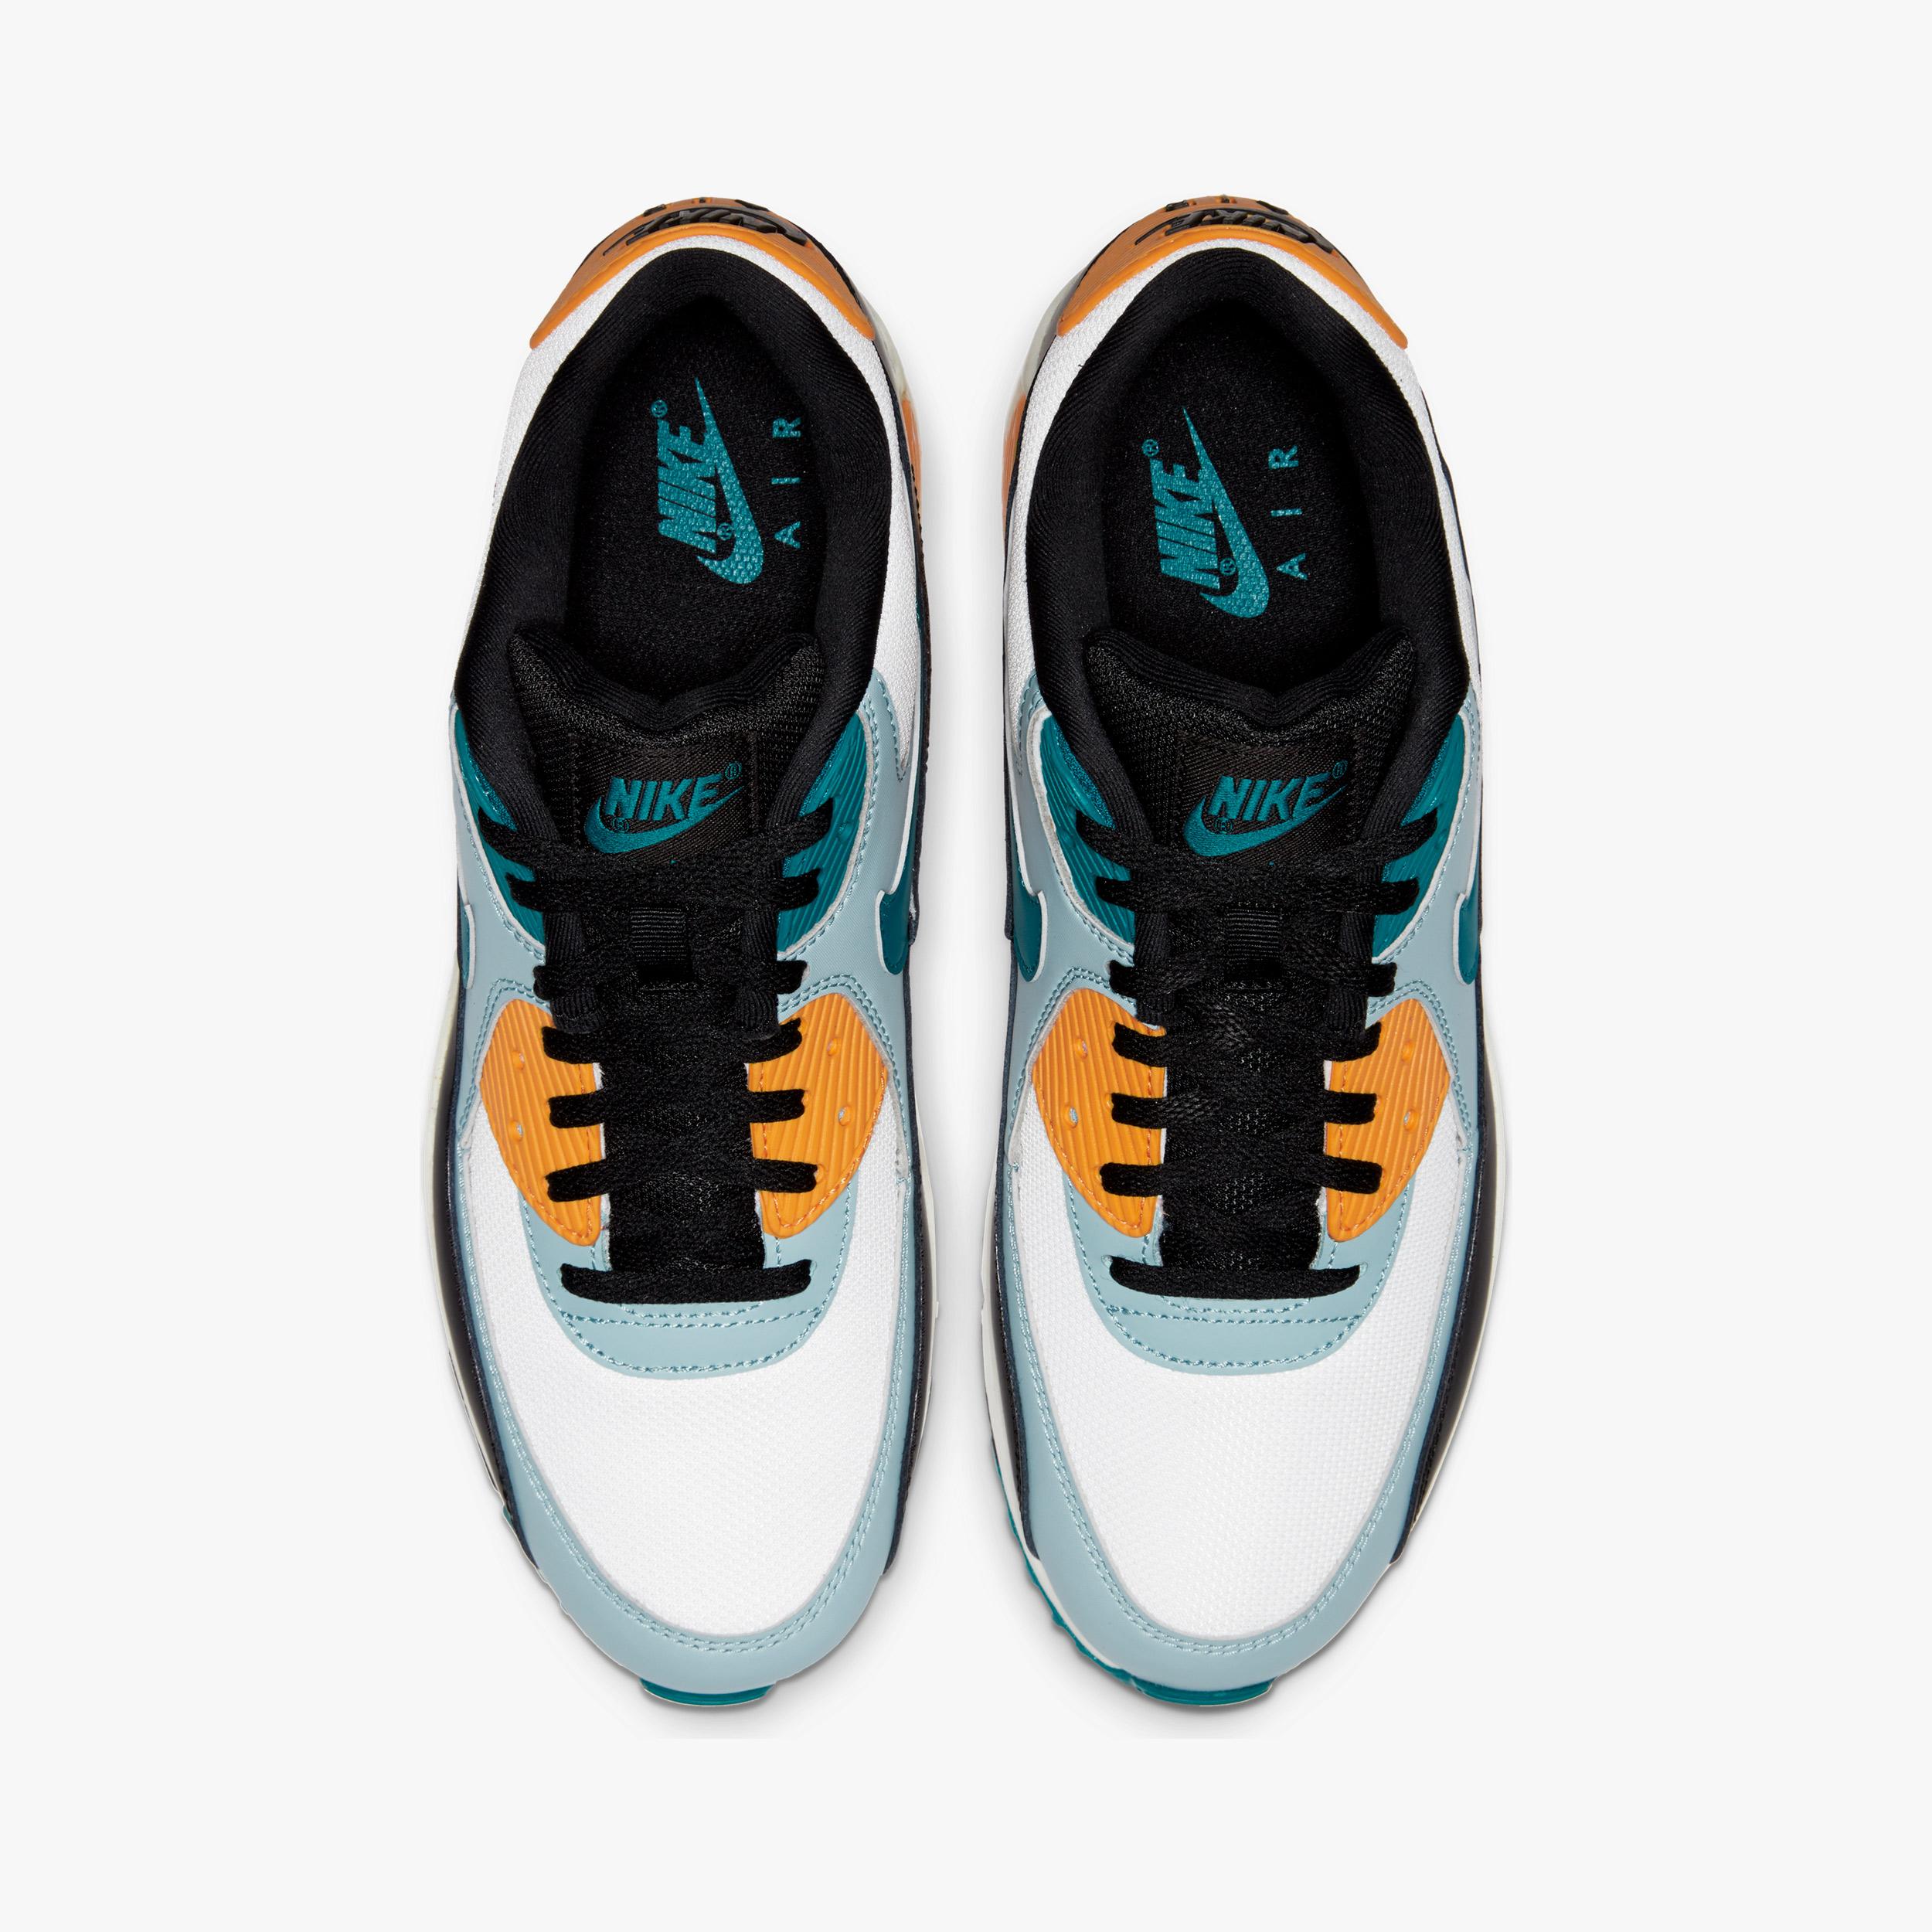 Nike Air Max 90 Essential - Aj1285-110 - SNS | sneakers ...